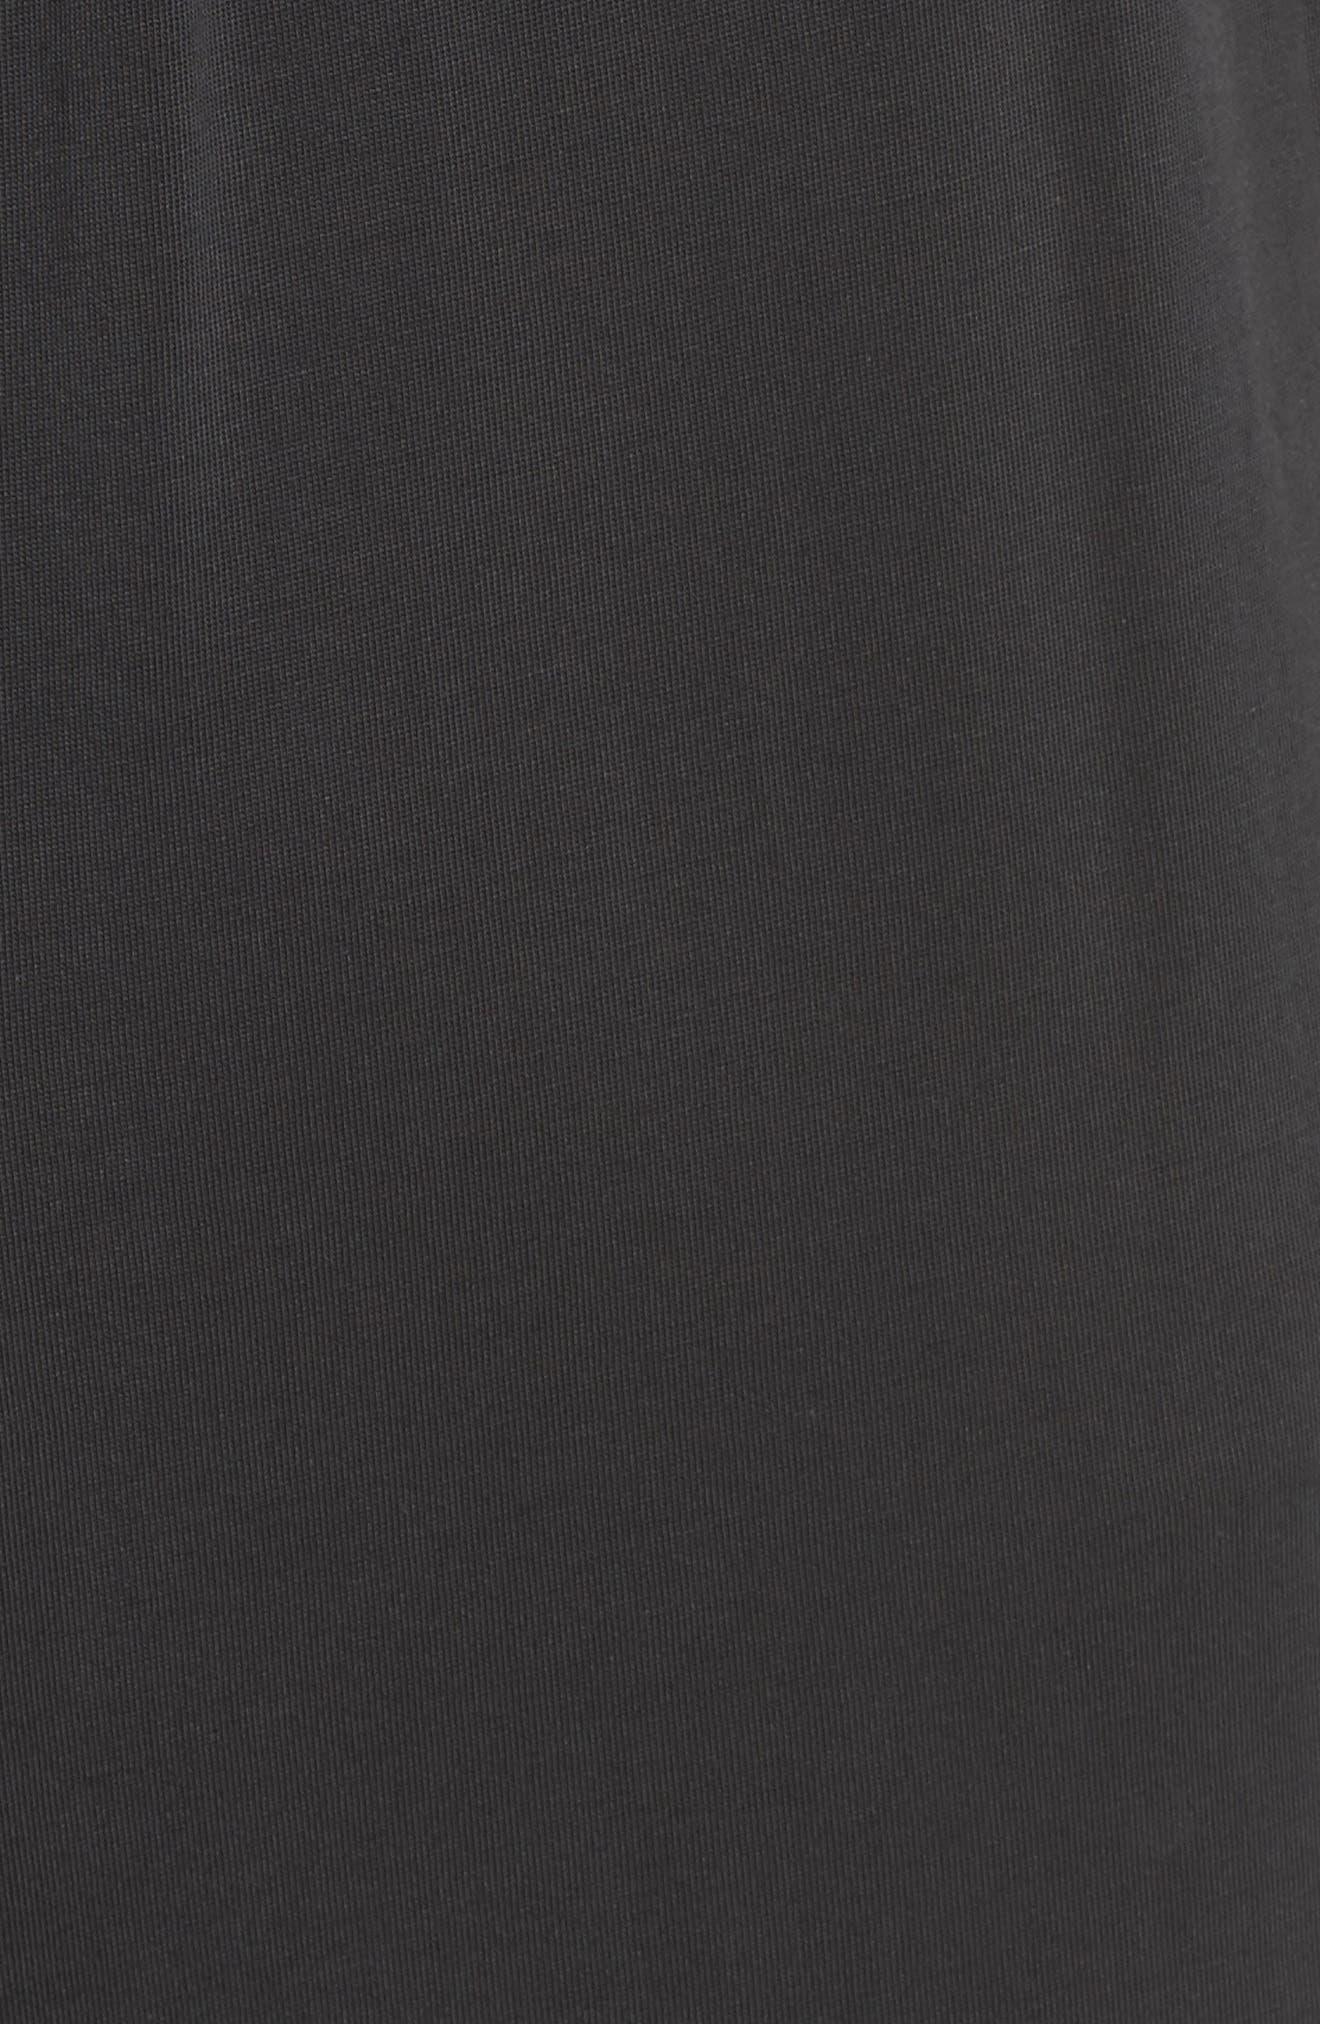 Jessa Jumpsuit,                             Alternate thumbnail 7, color,                             Black